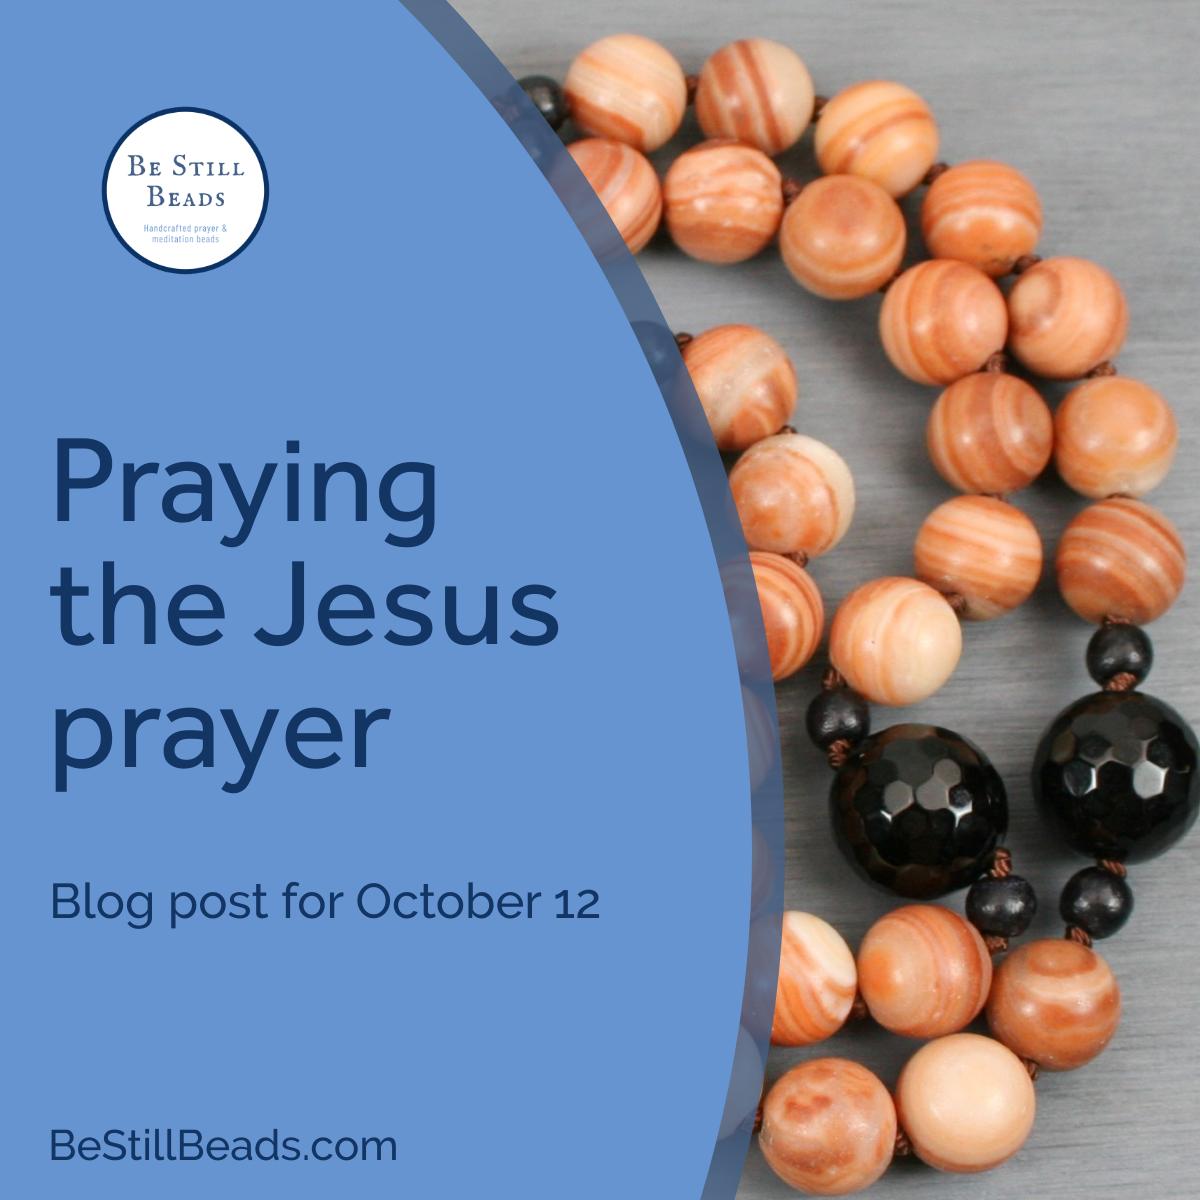 Praying the Jesus prayer